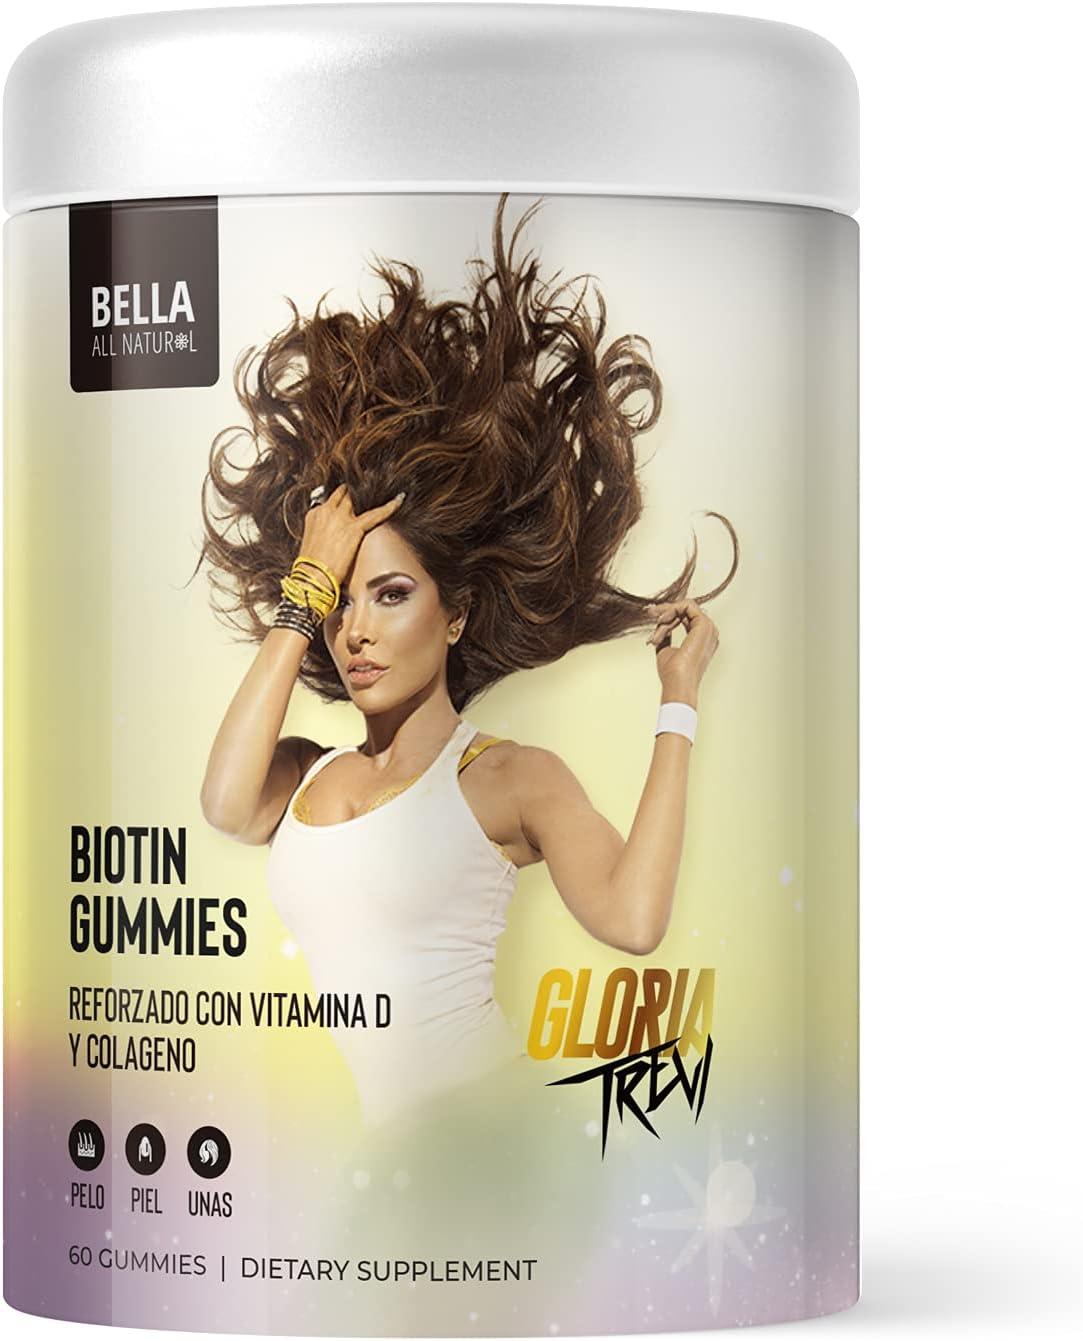 Bella All Natural Gloria Trevi Gummies Vi Skin Ranking TOP20 Nails Hair Selling rankings - and